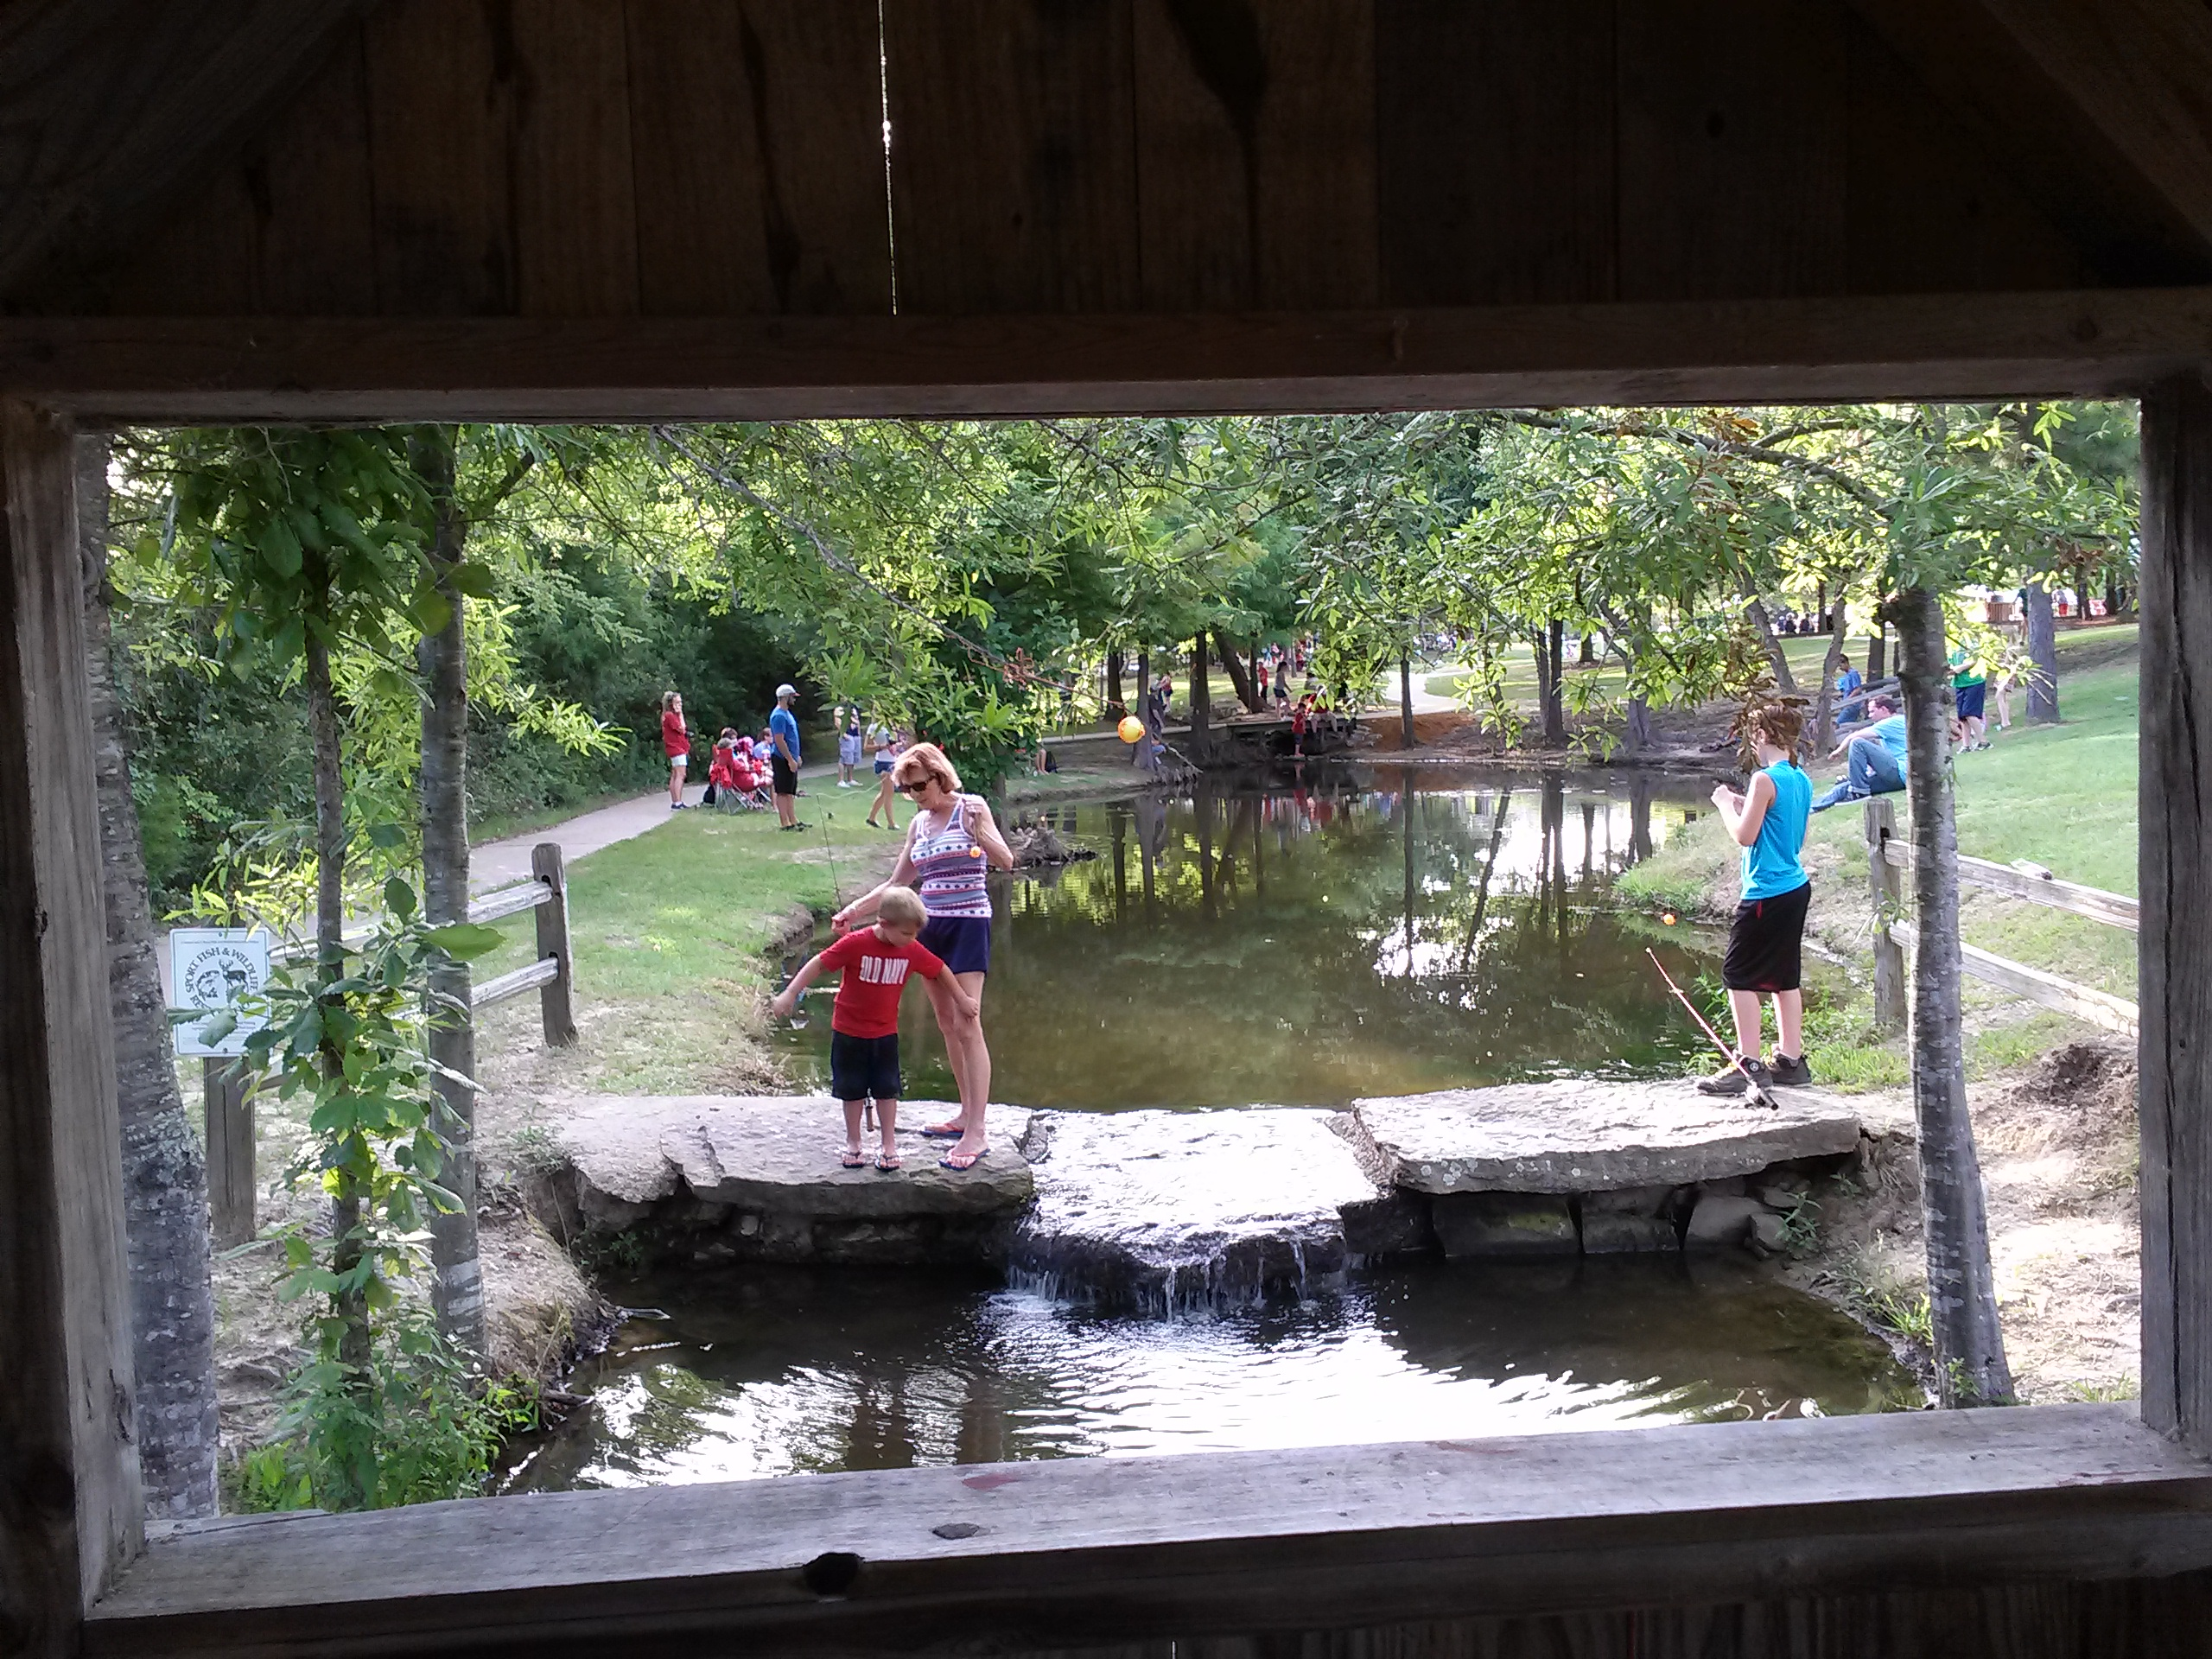 Texas Freshwater Fishery Center Athens, Texas 2015 | Albert